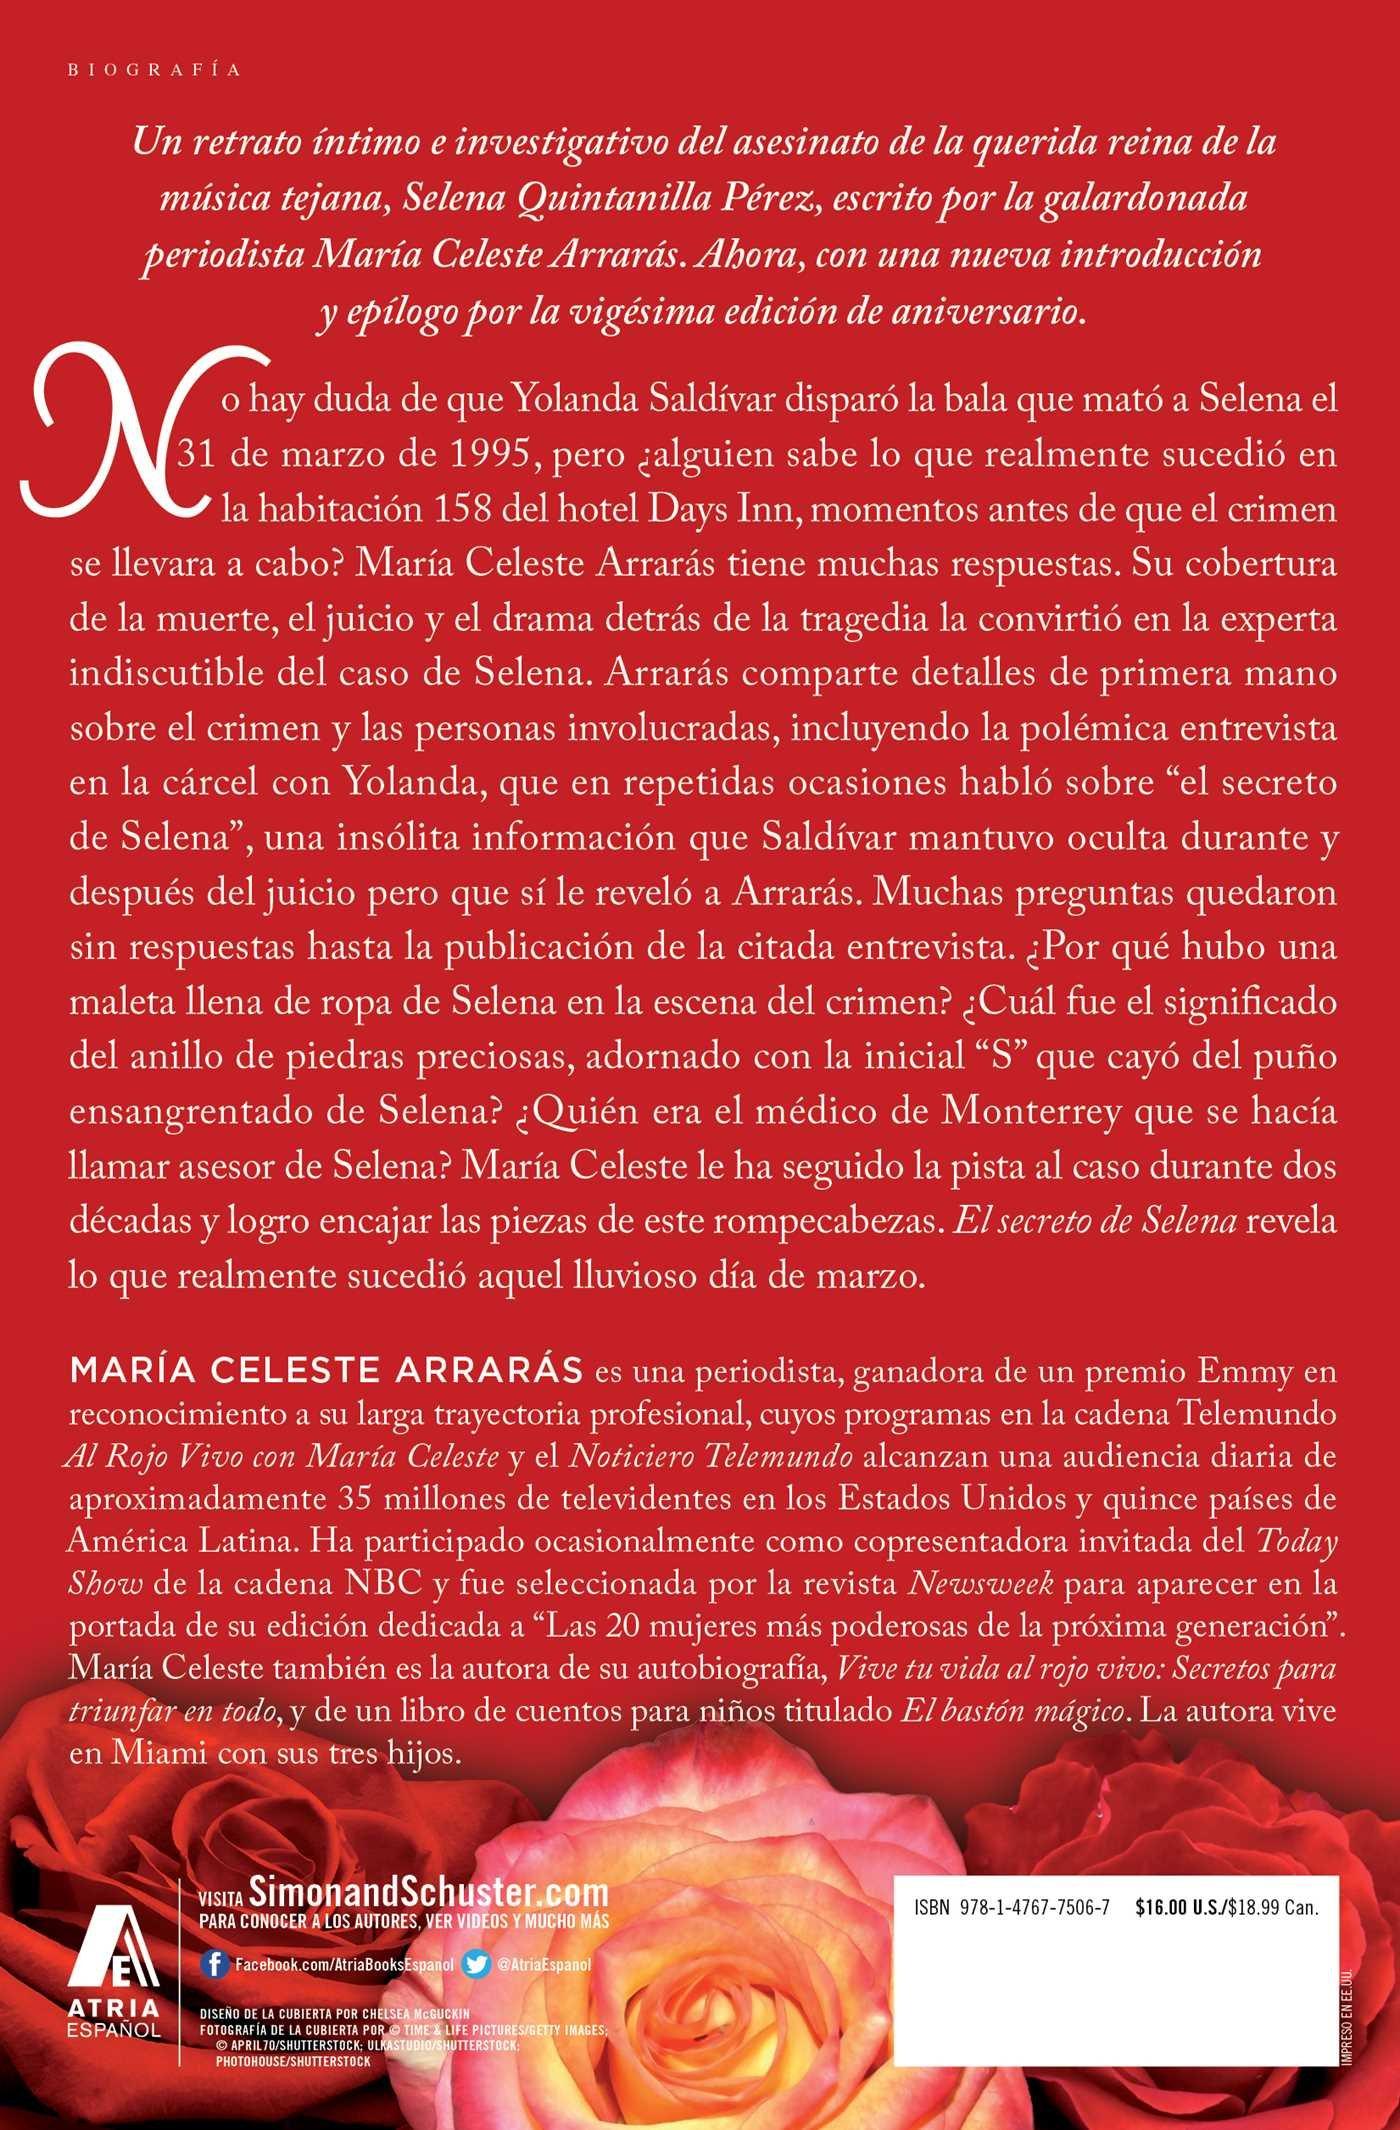 El secreto de Selena (Selenas Secret): La reveladora historia detrás su trágica muerte (Atria Espanol) (Spanish Edition): María Celeste Arrarás: ...